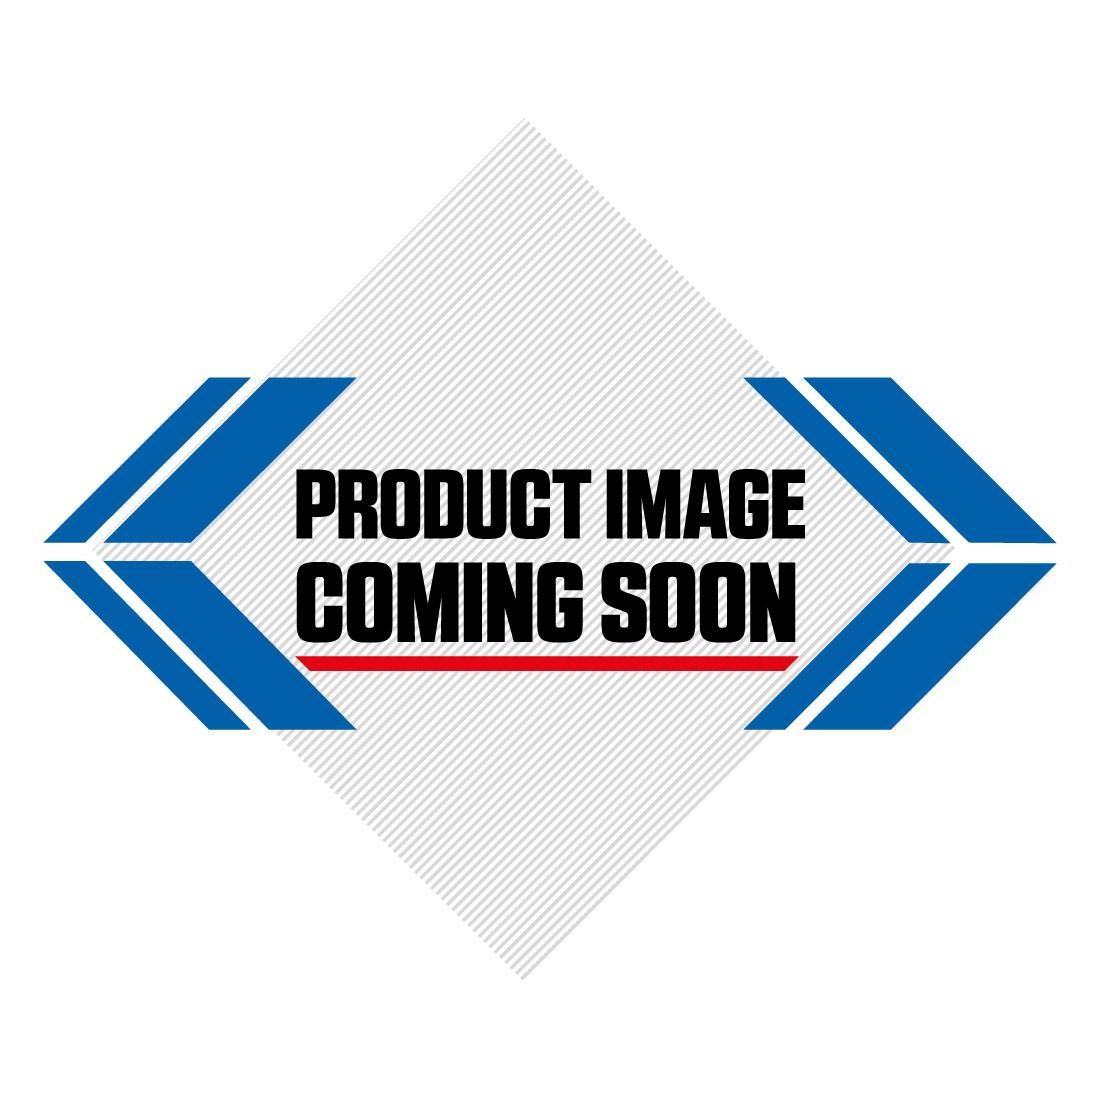 Kawasaki Restyled Plastic Kit KX 85 (2010) OEM Factory Image-2>